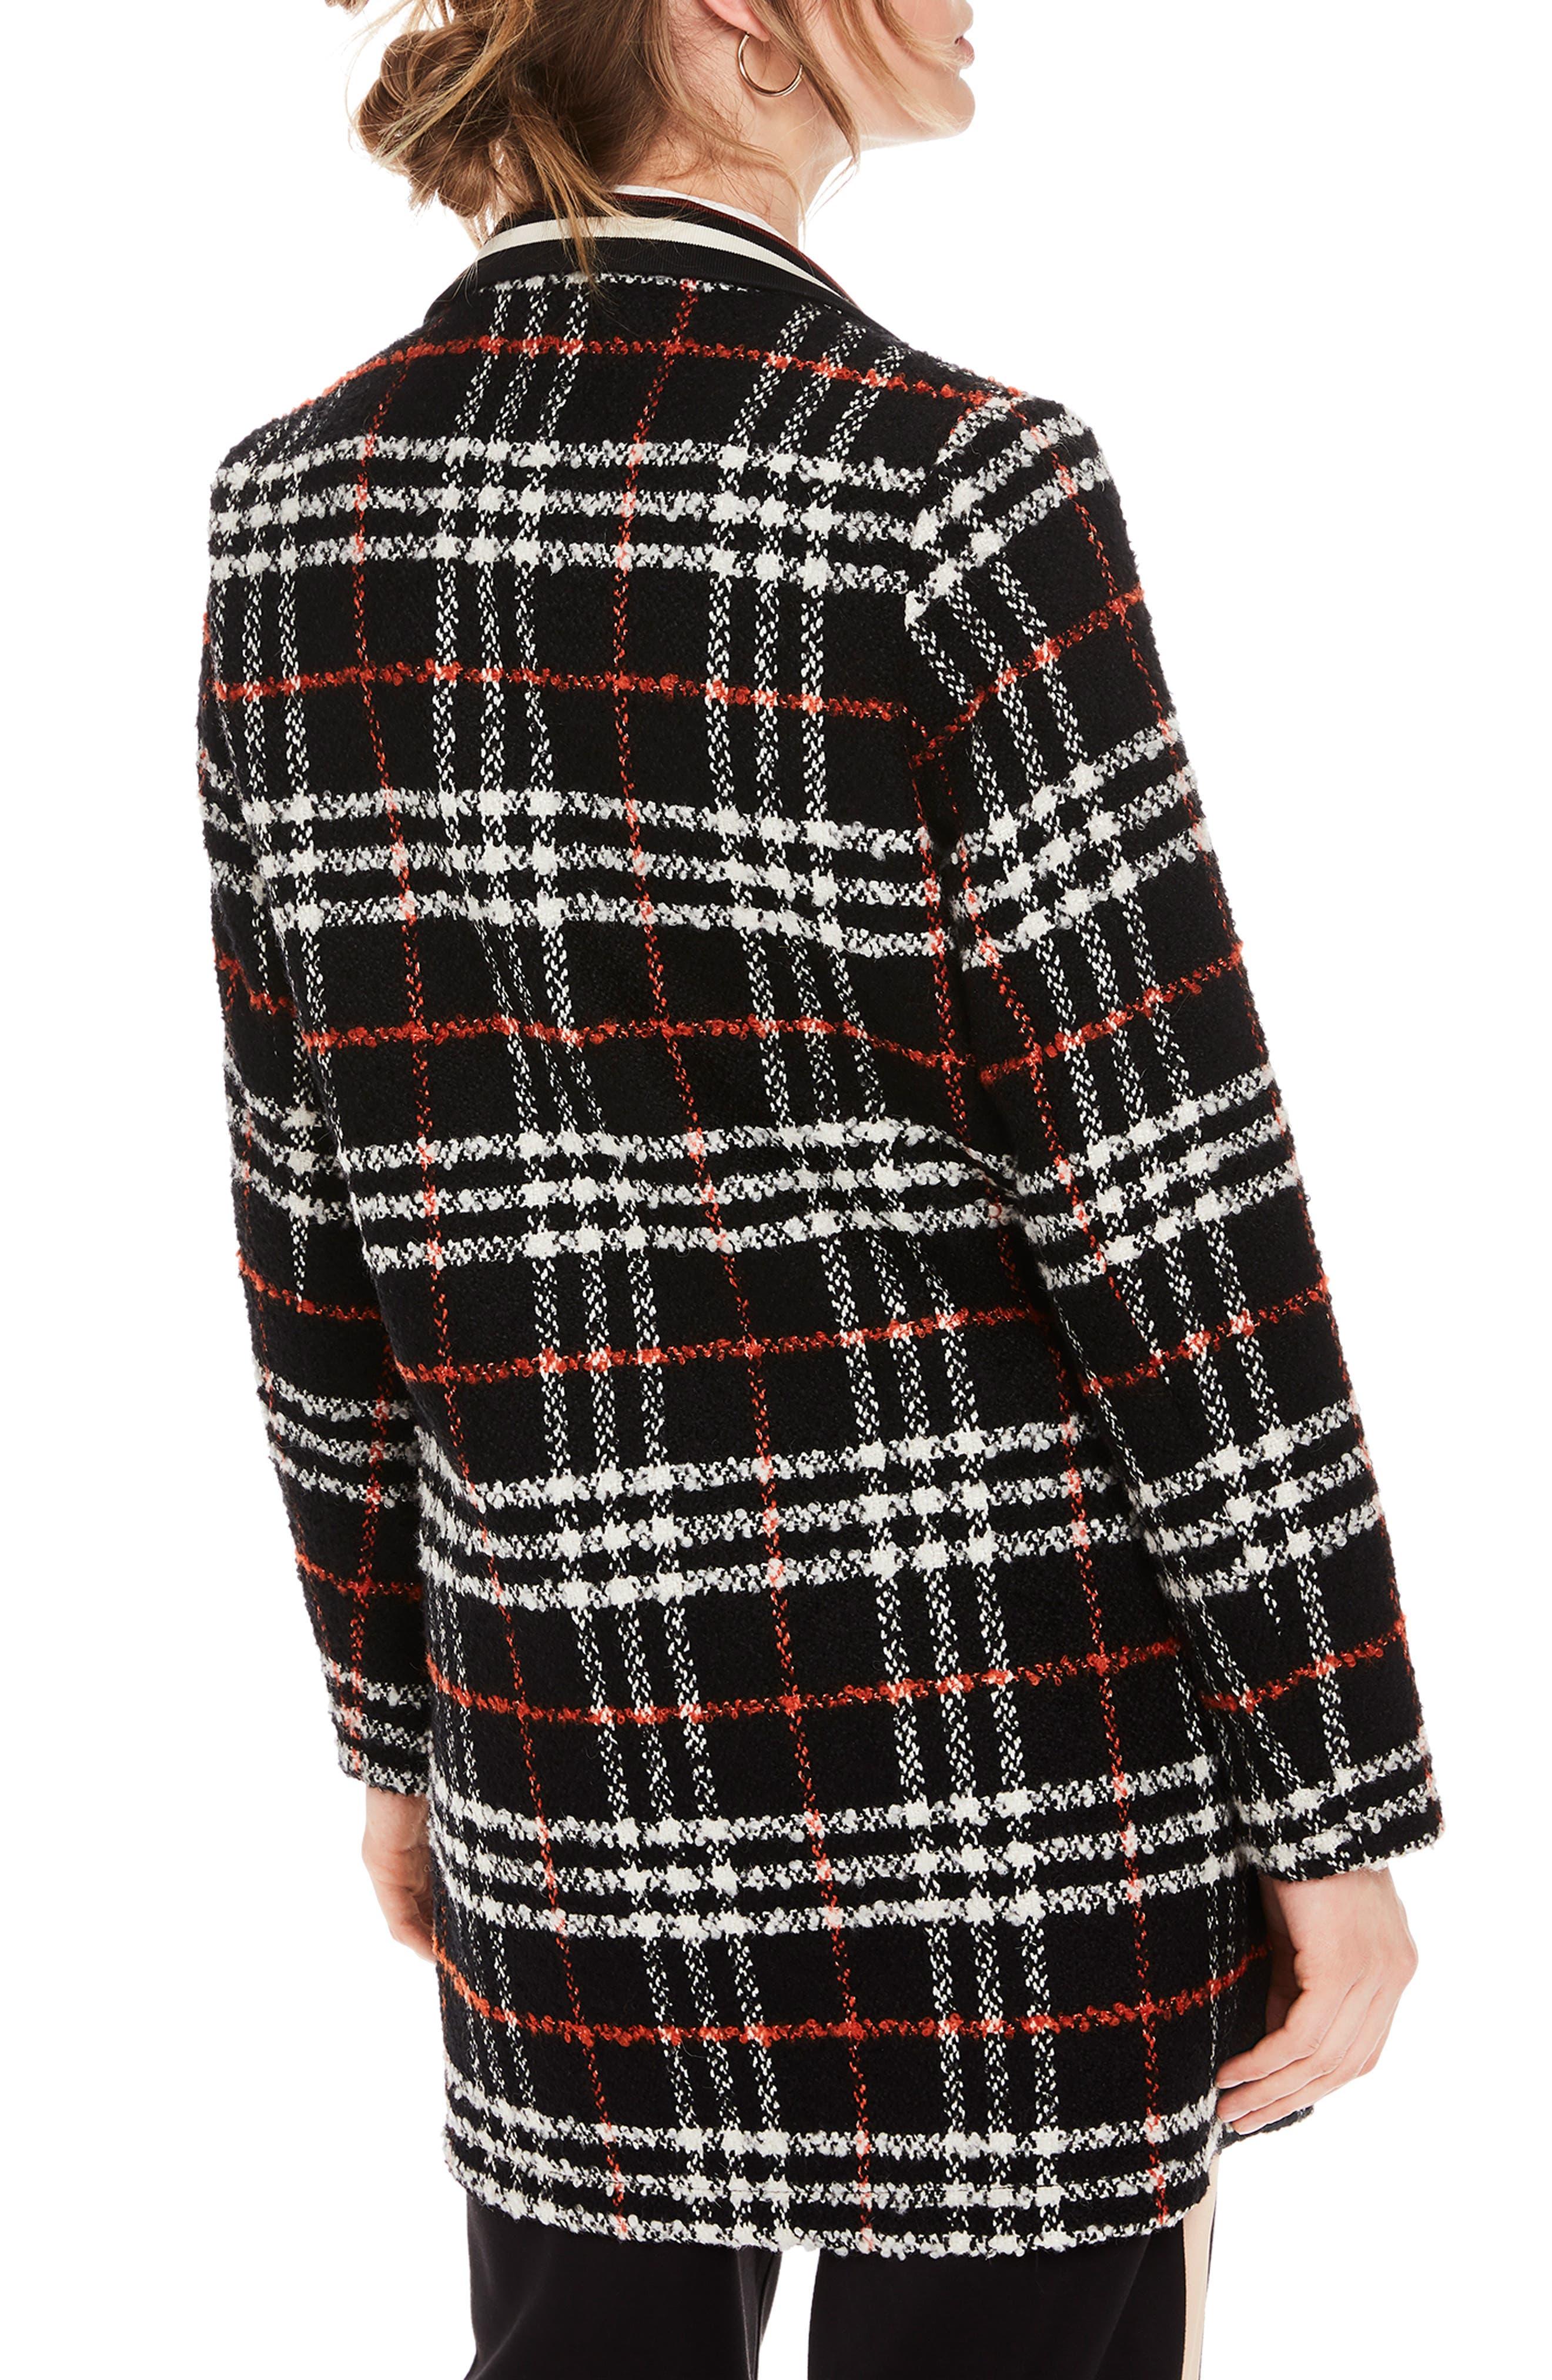 Bonded Wool Blend Jacket,                             Alternate thumbnail 2, color,                             001